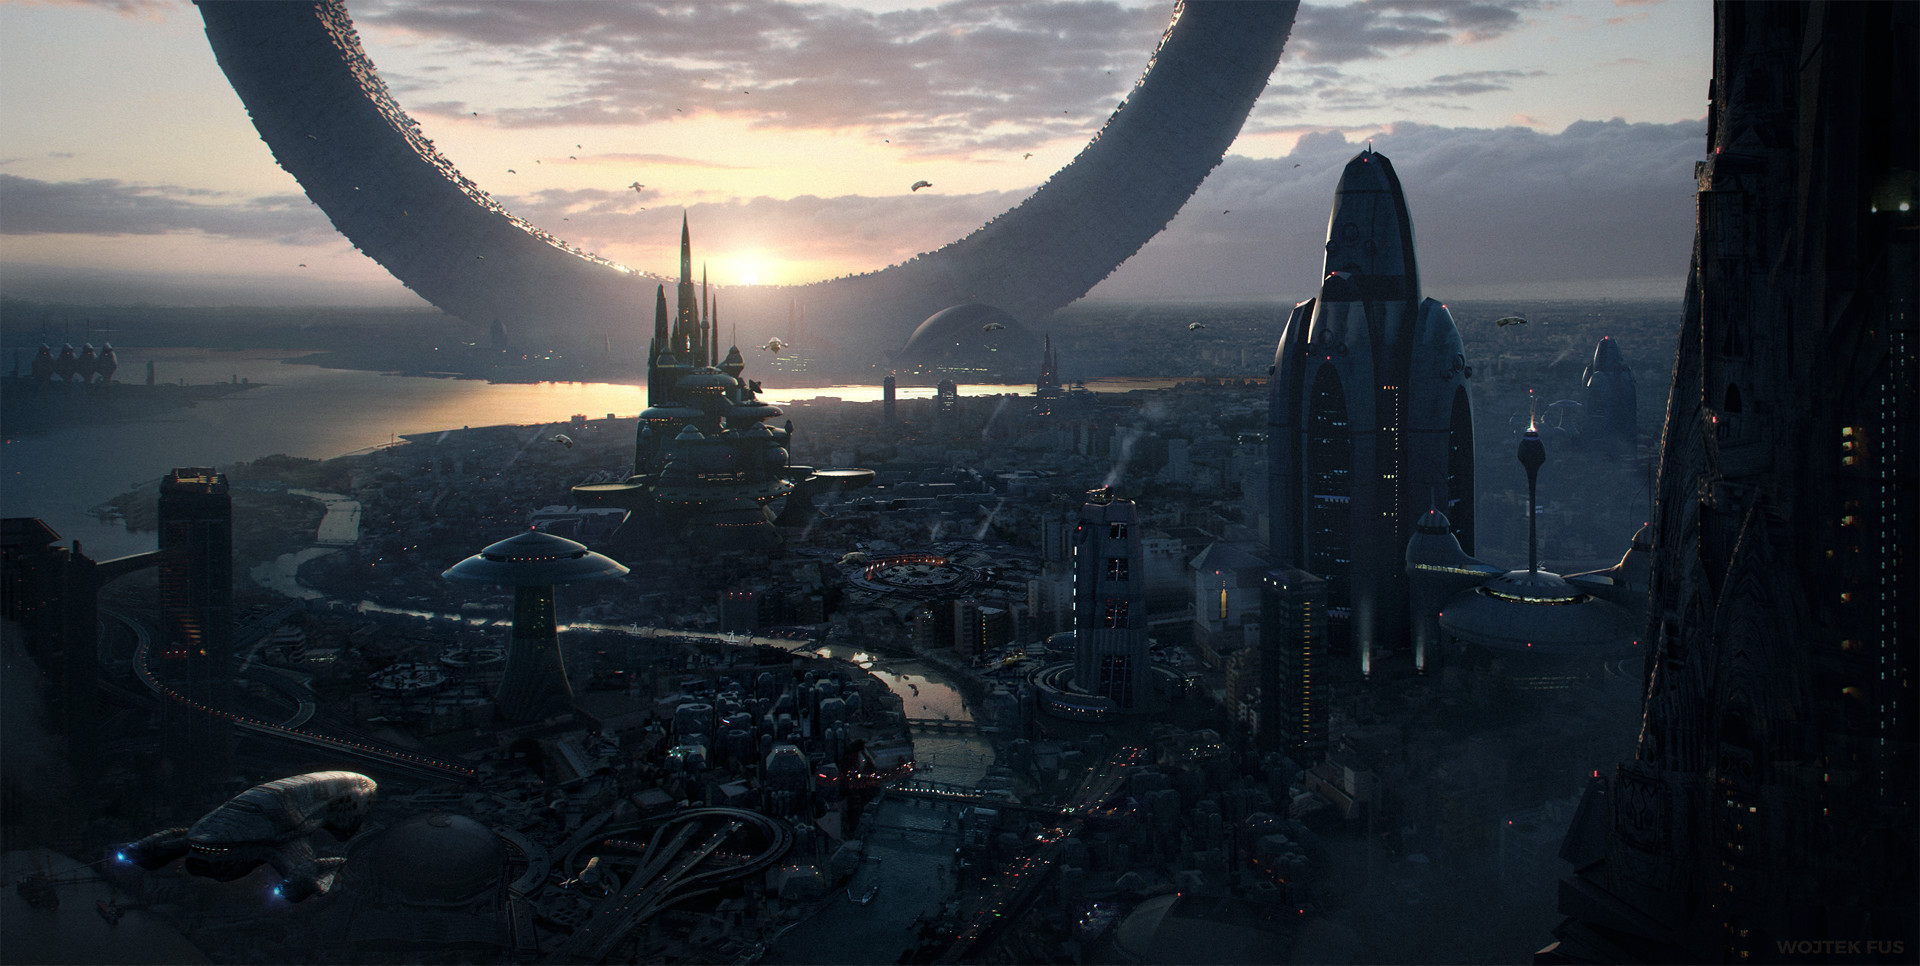 Wojtek fus cityscape